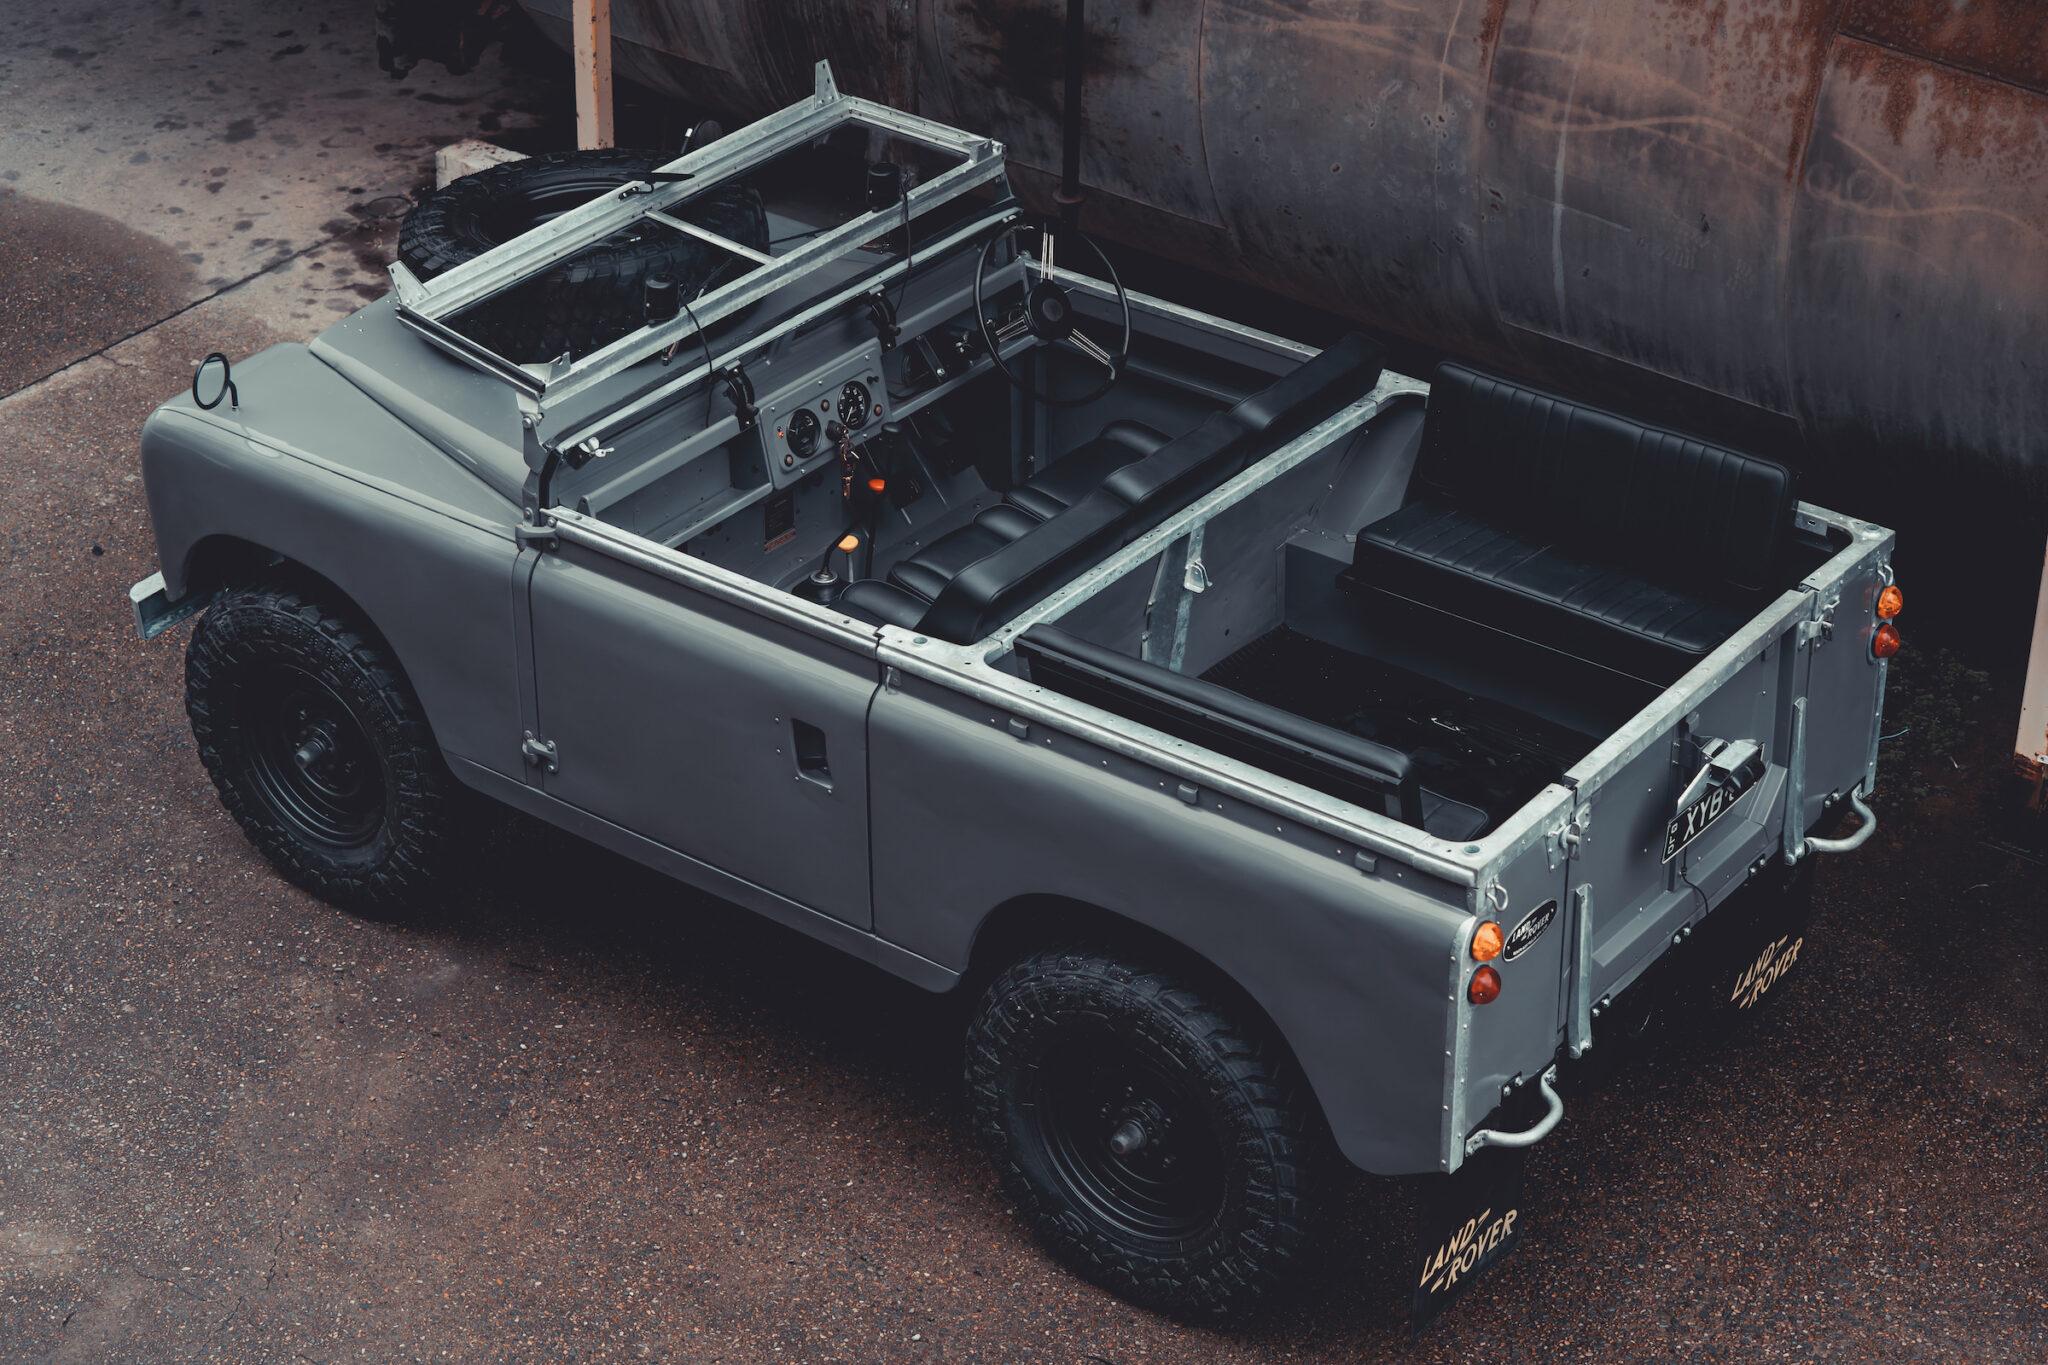 Land-Rover-Series-2A-Restoration-1-2048x1365